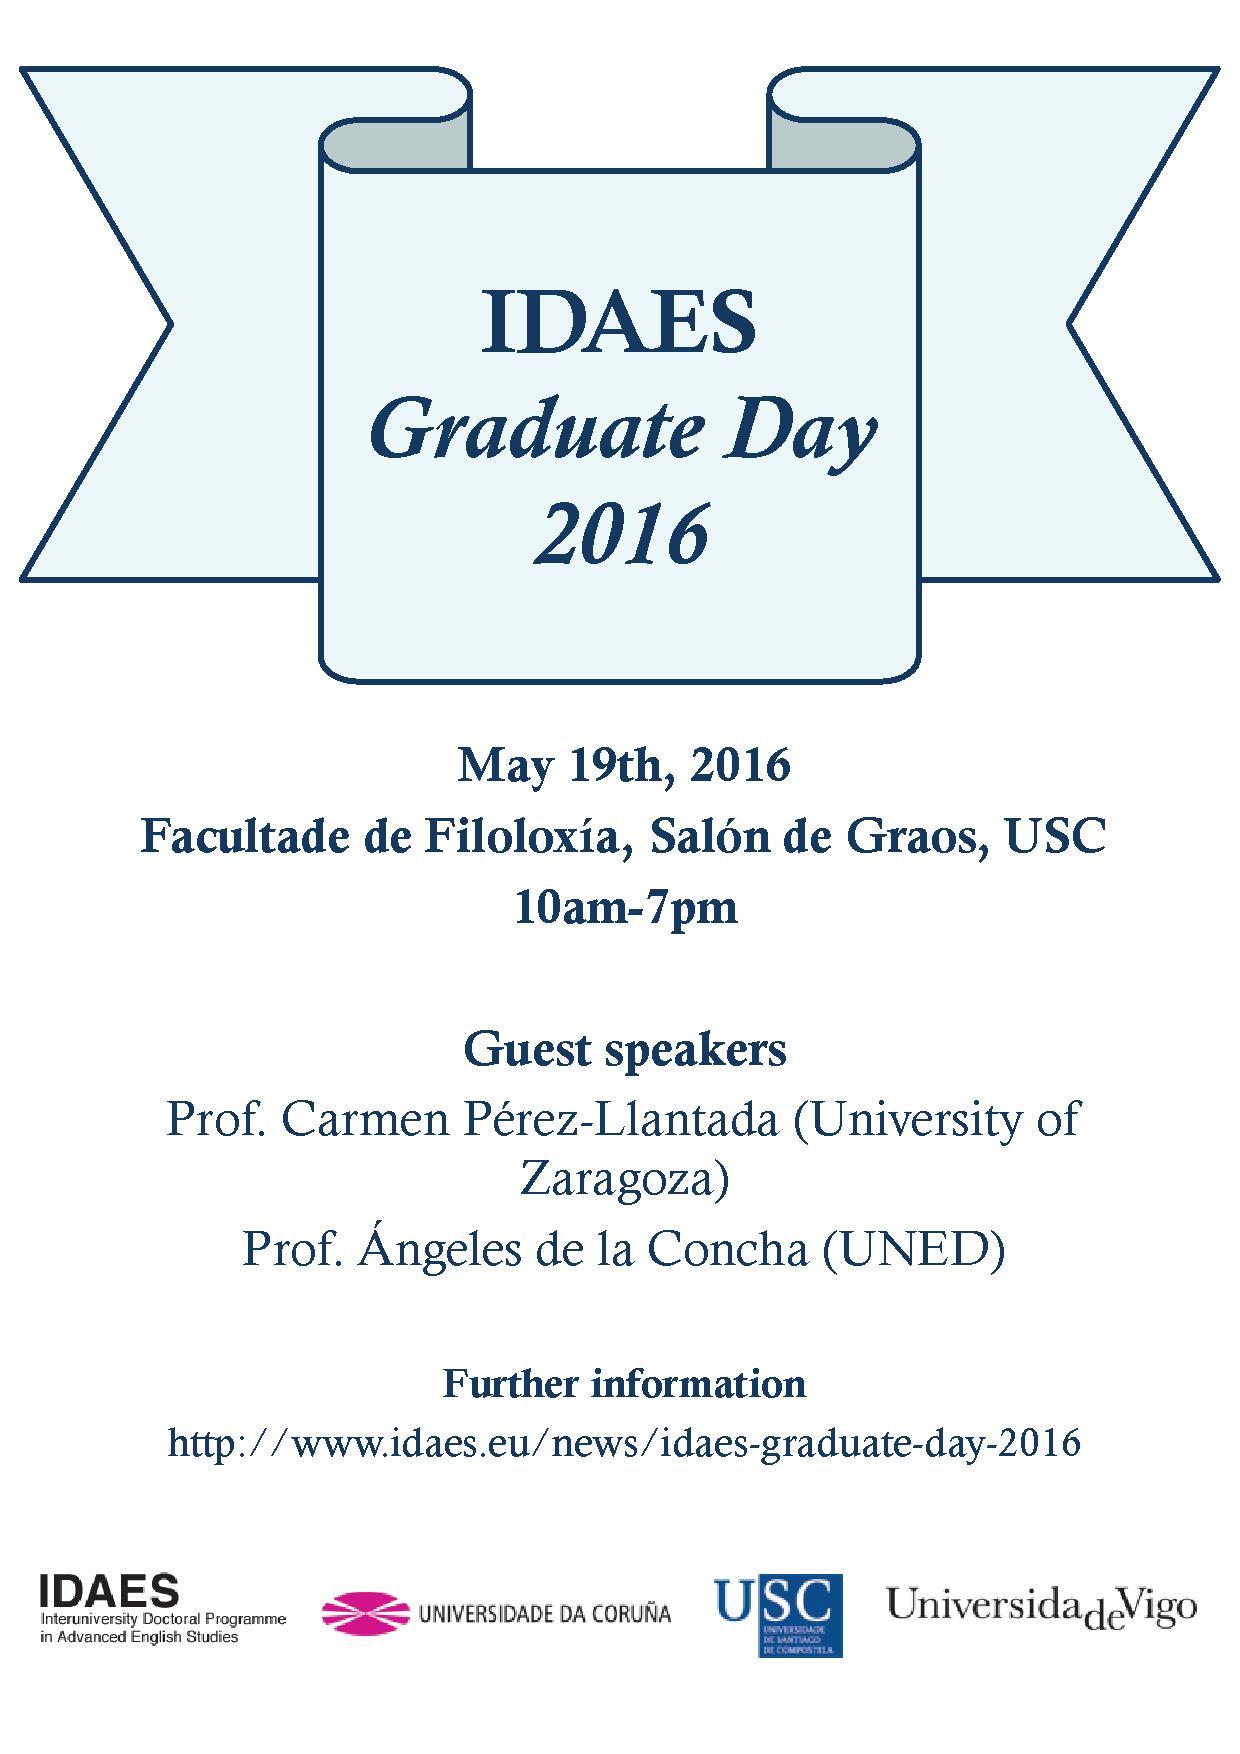 idaes_graduate_day_2016_poster